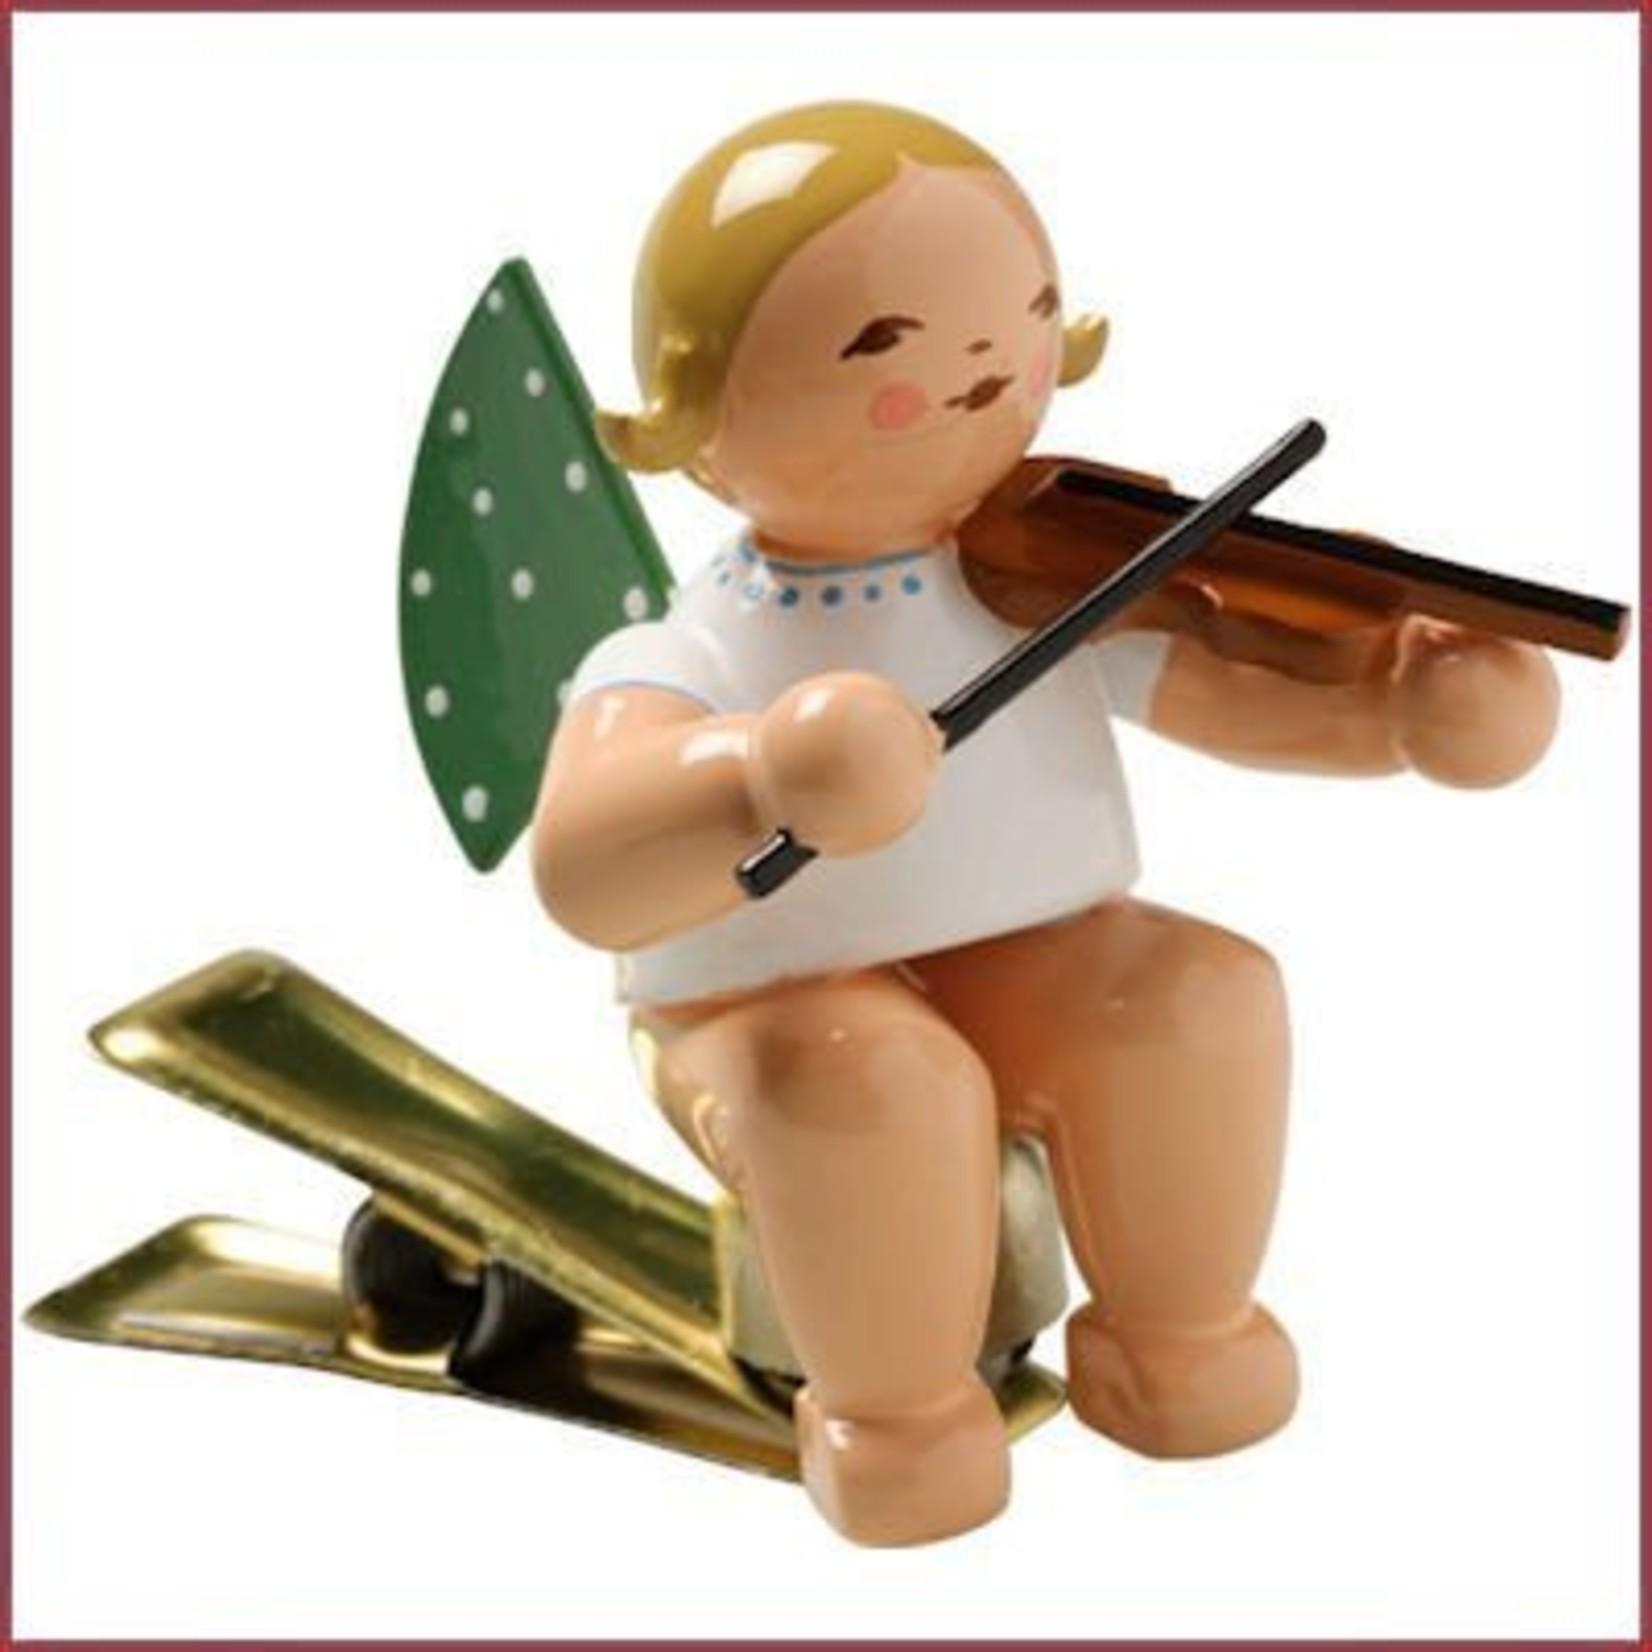 Wendt & Kühn Kerstboomknijpertje Grunhainichense Engel met viool